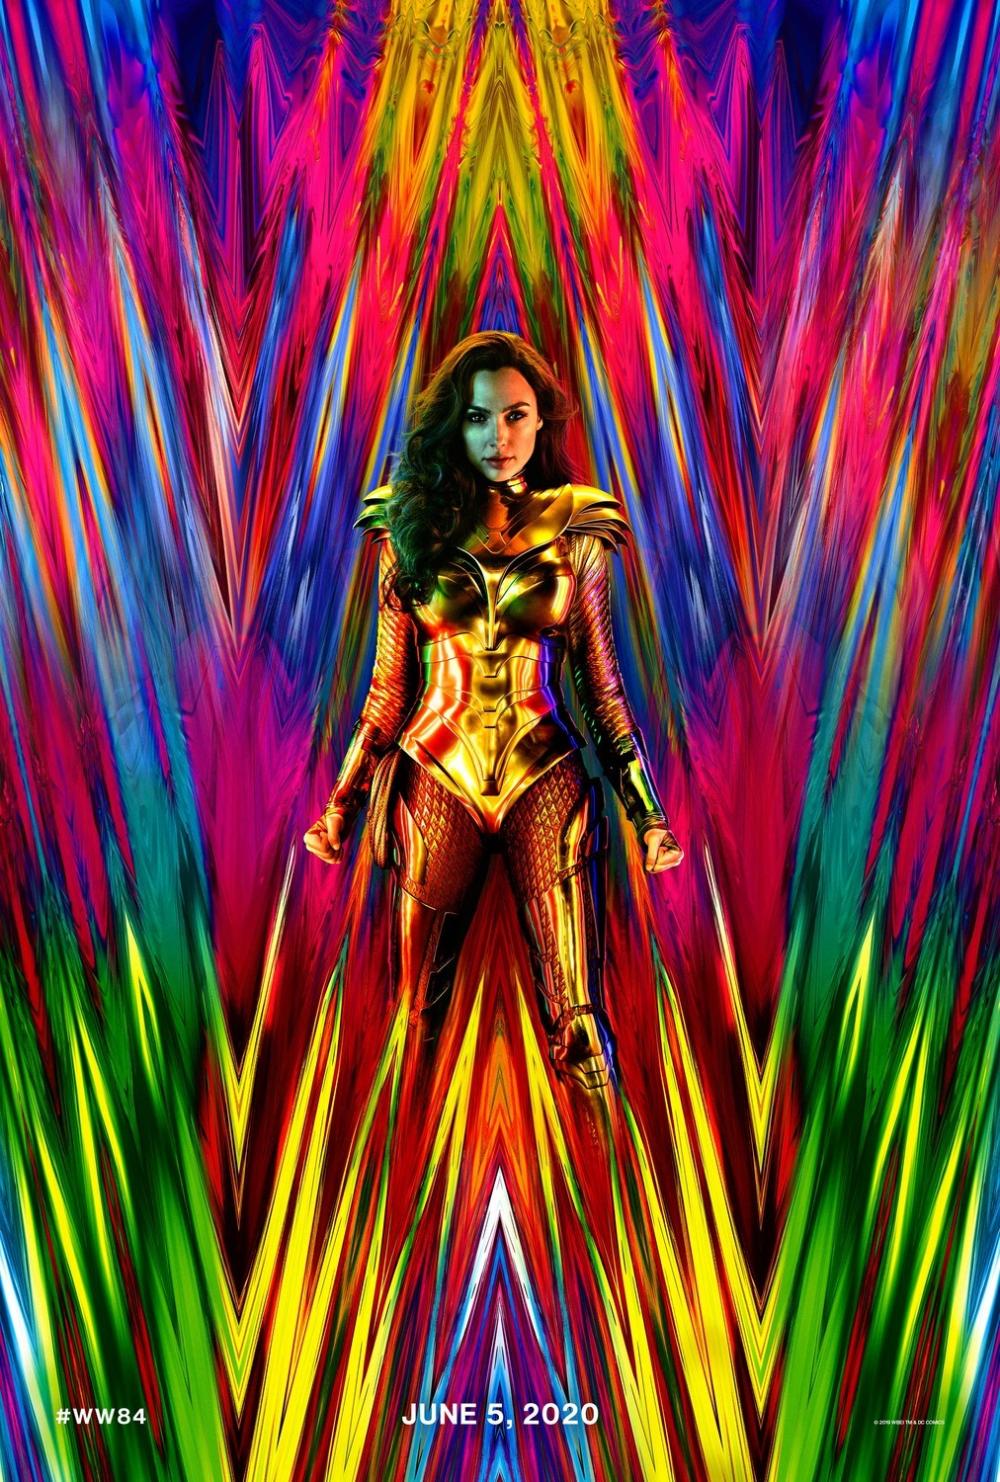 Pin By Katie On Pop In 2020 Wonder Woman 1984 Movie Gal Gadot Wonder Woman